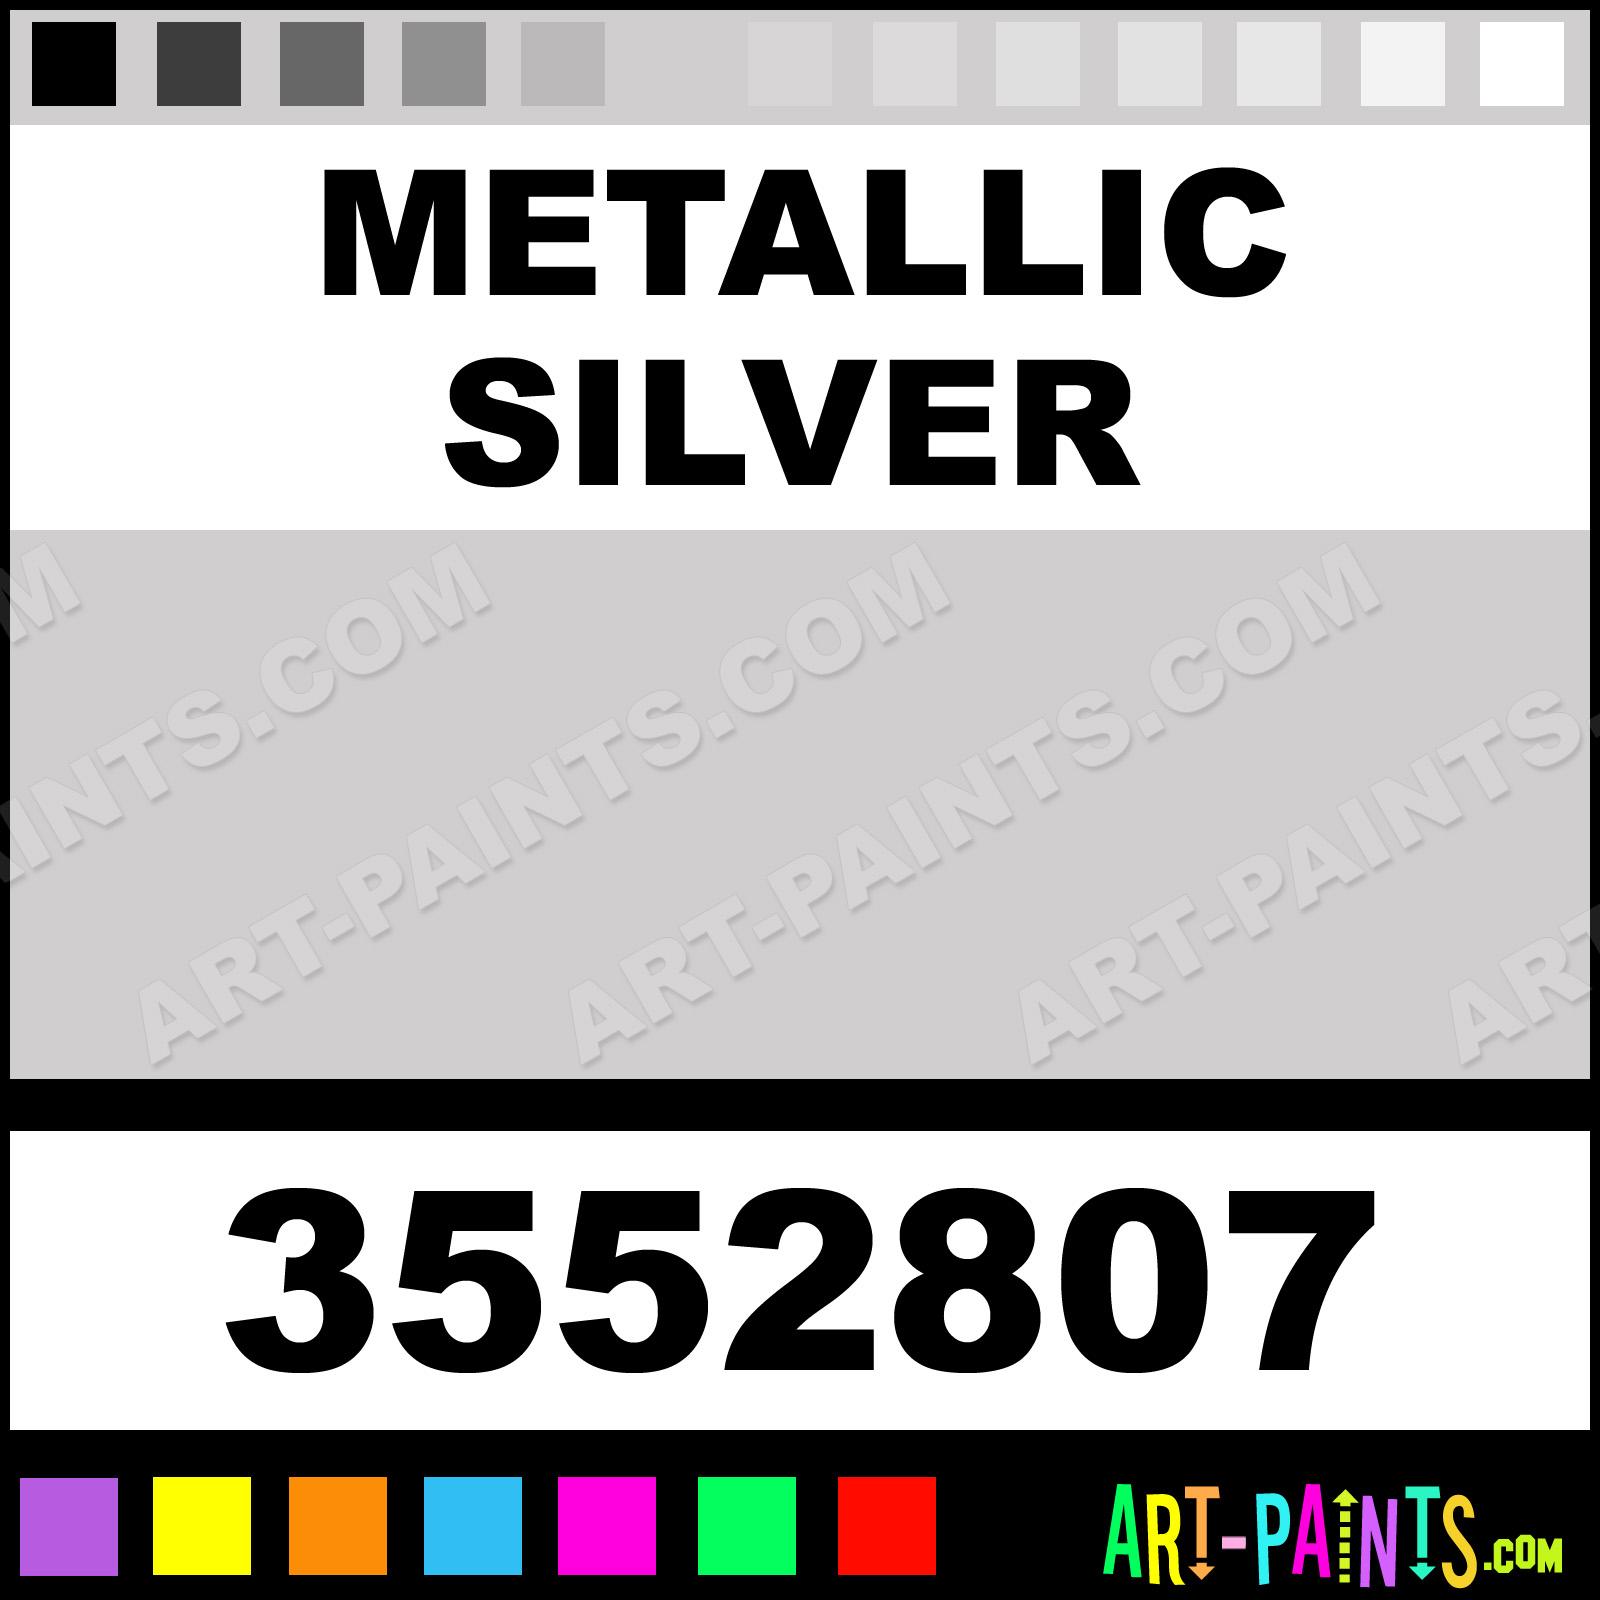 Metallic Silver Pigmented Acrylic Ink Calligraphy Inks